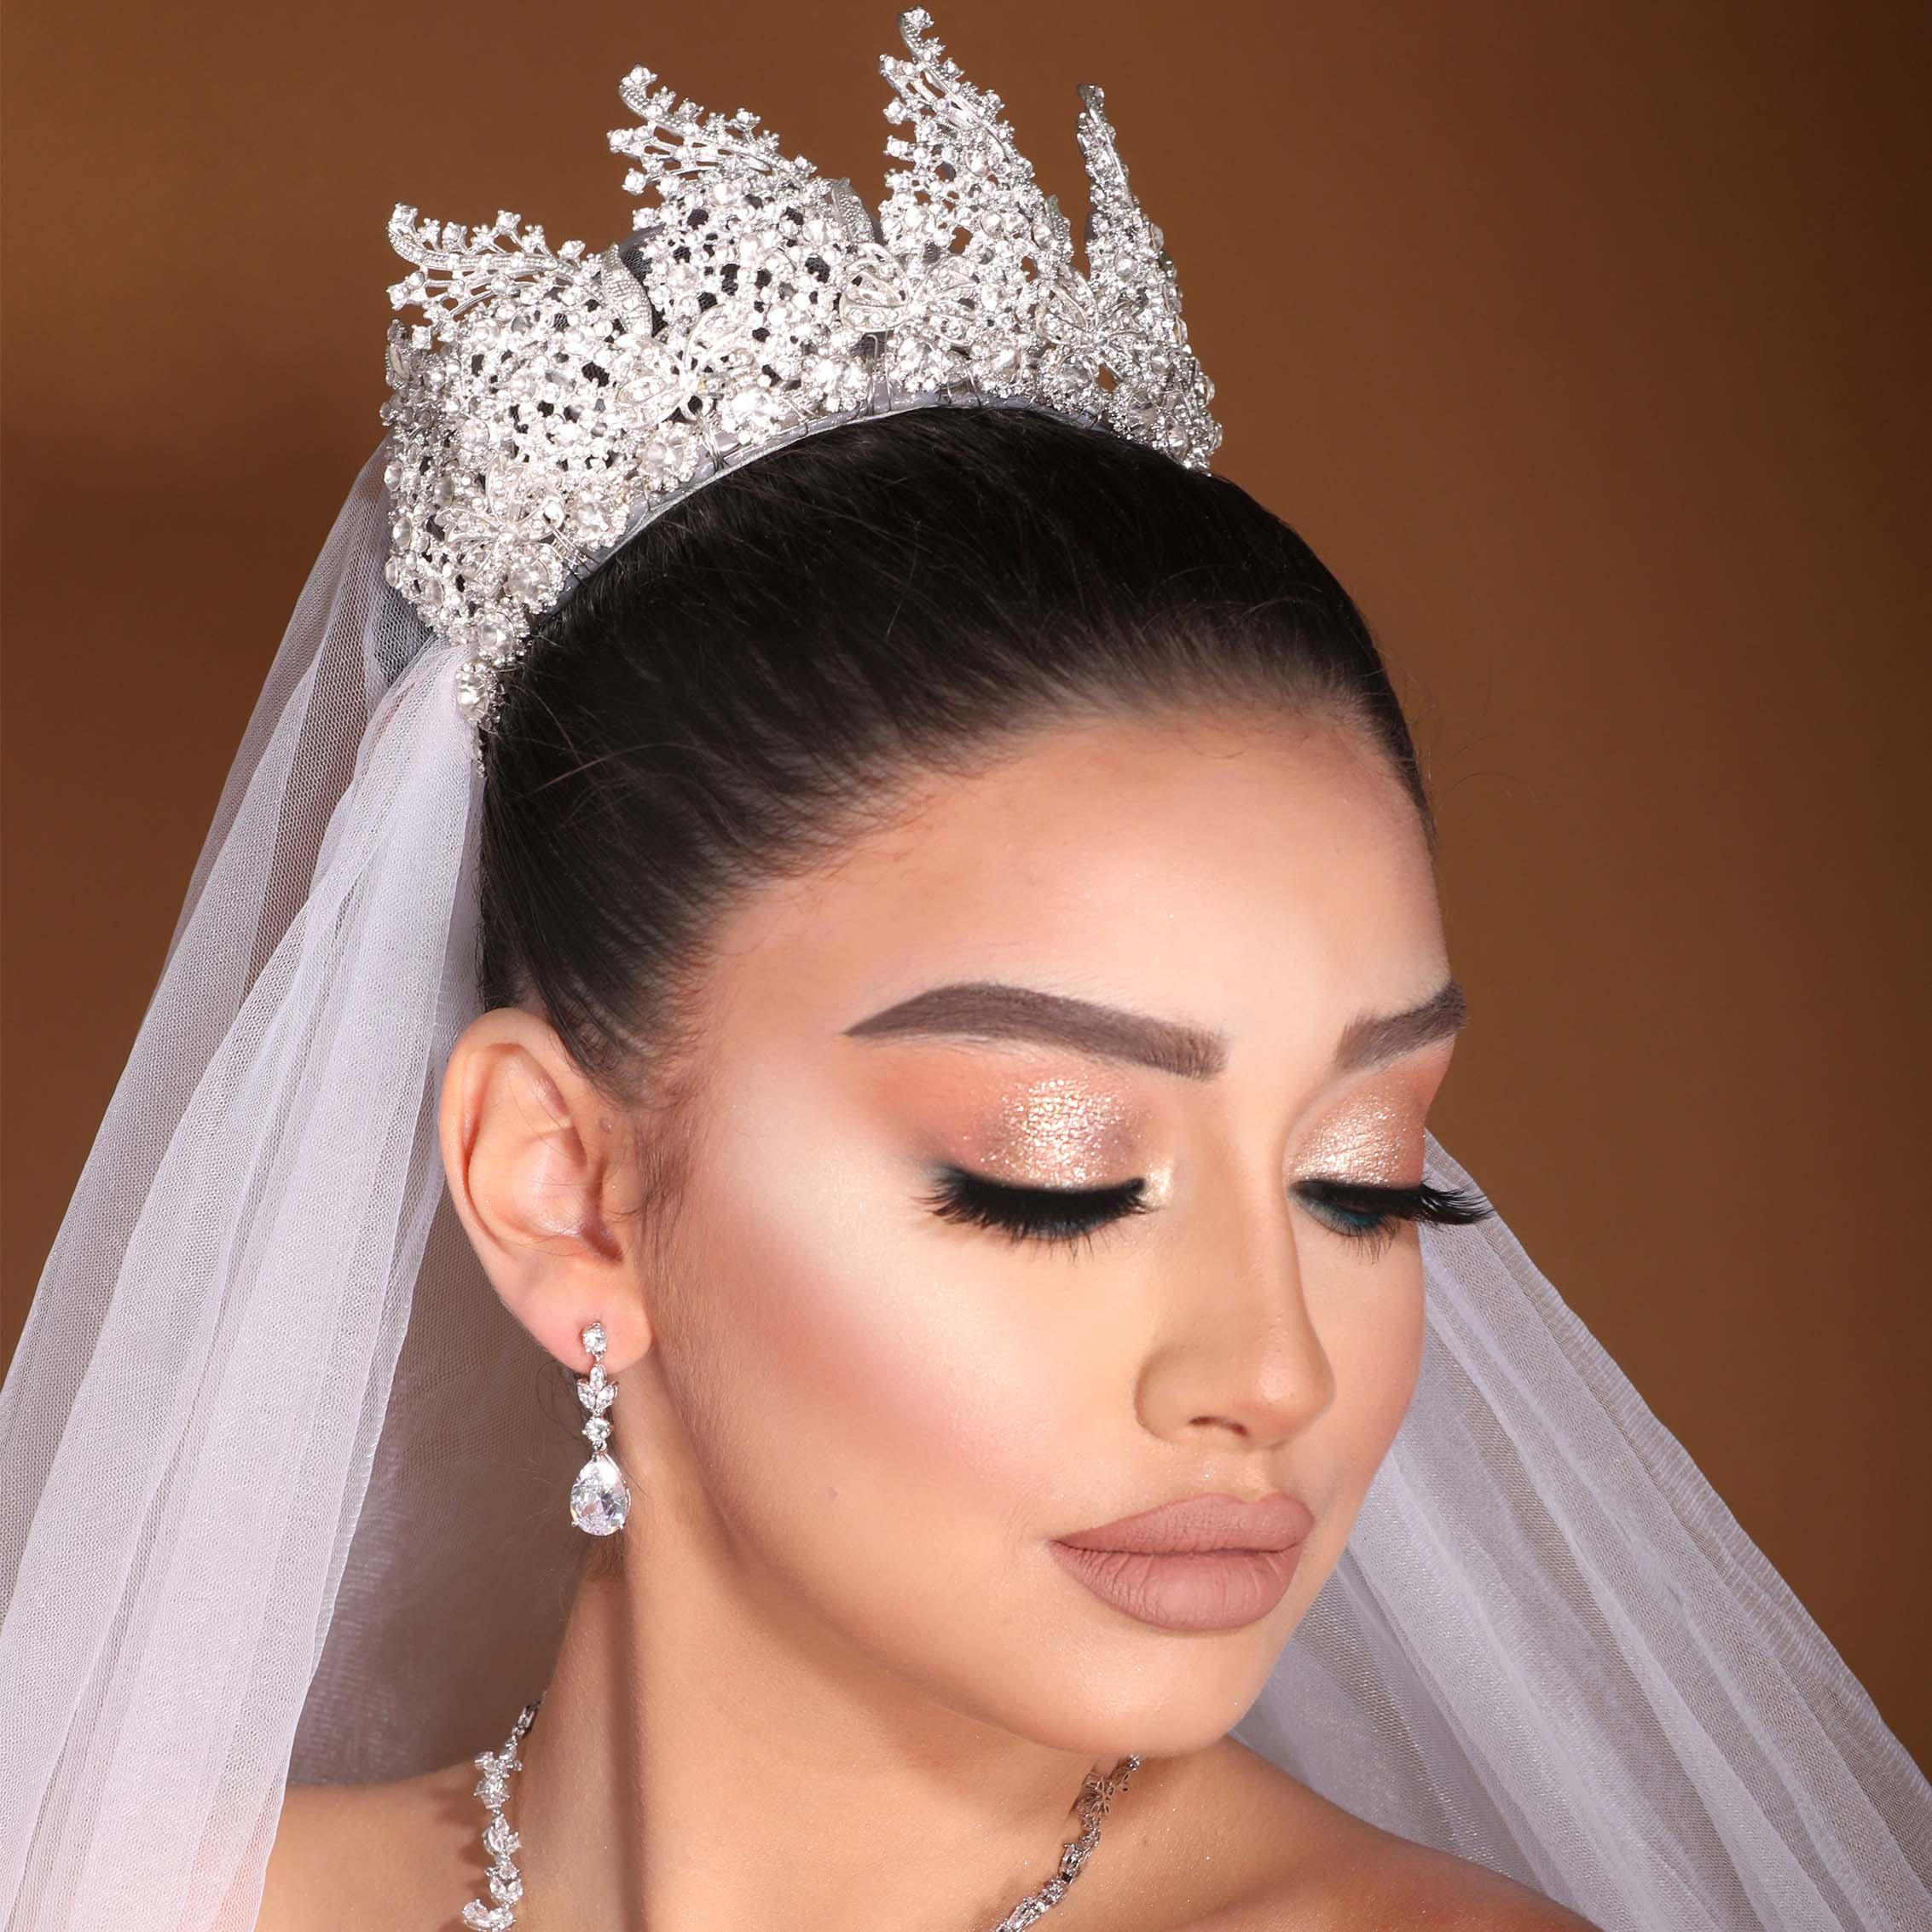 Bridal Makeup (For The Bride)